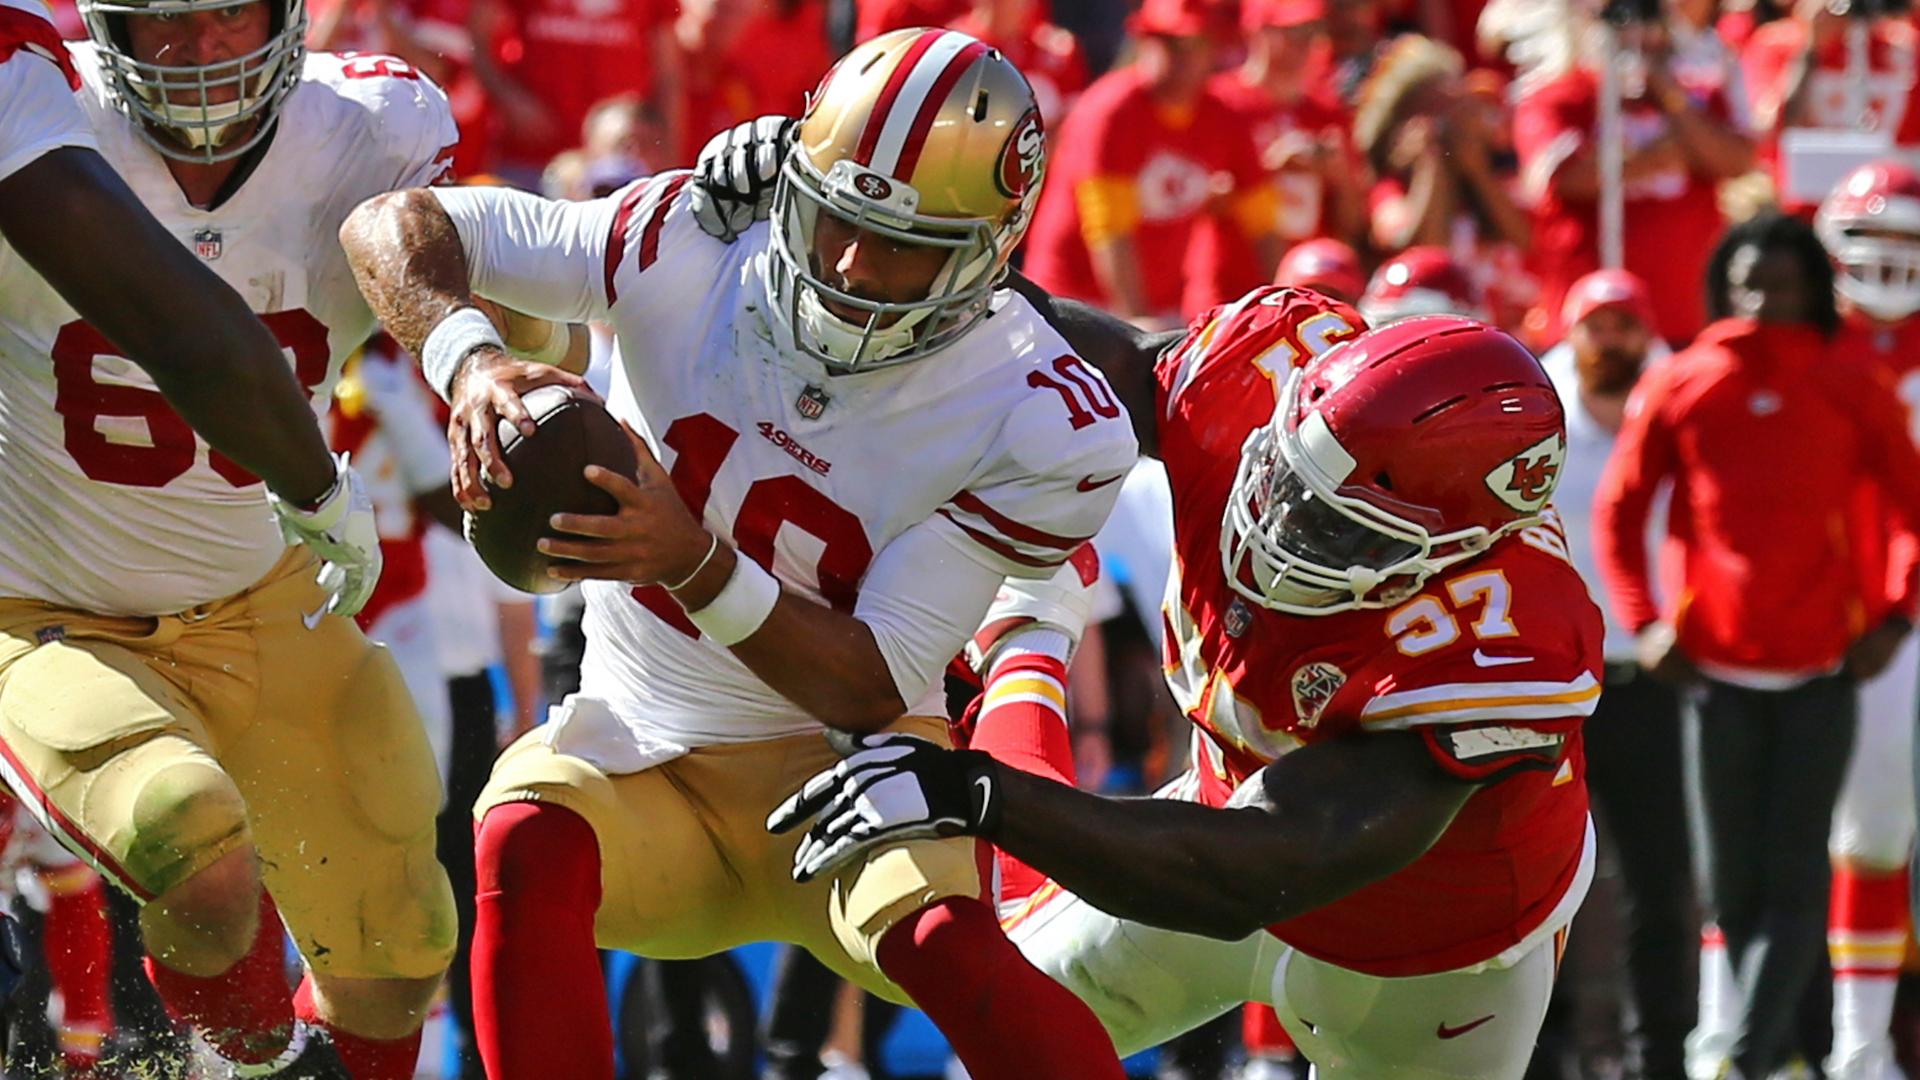 49ers vs Chiefs live stream How to watch NFL preseason game 1920x1080